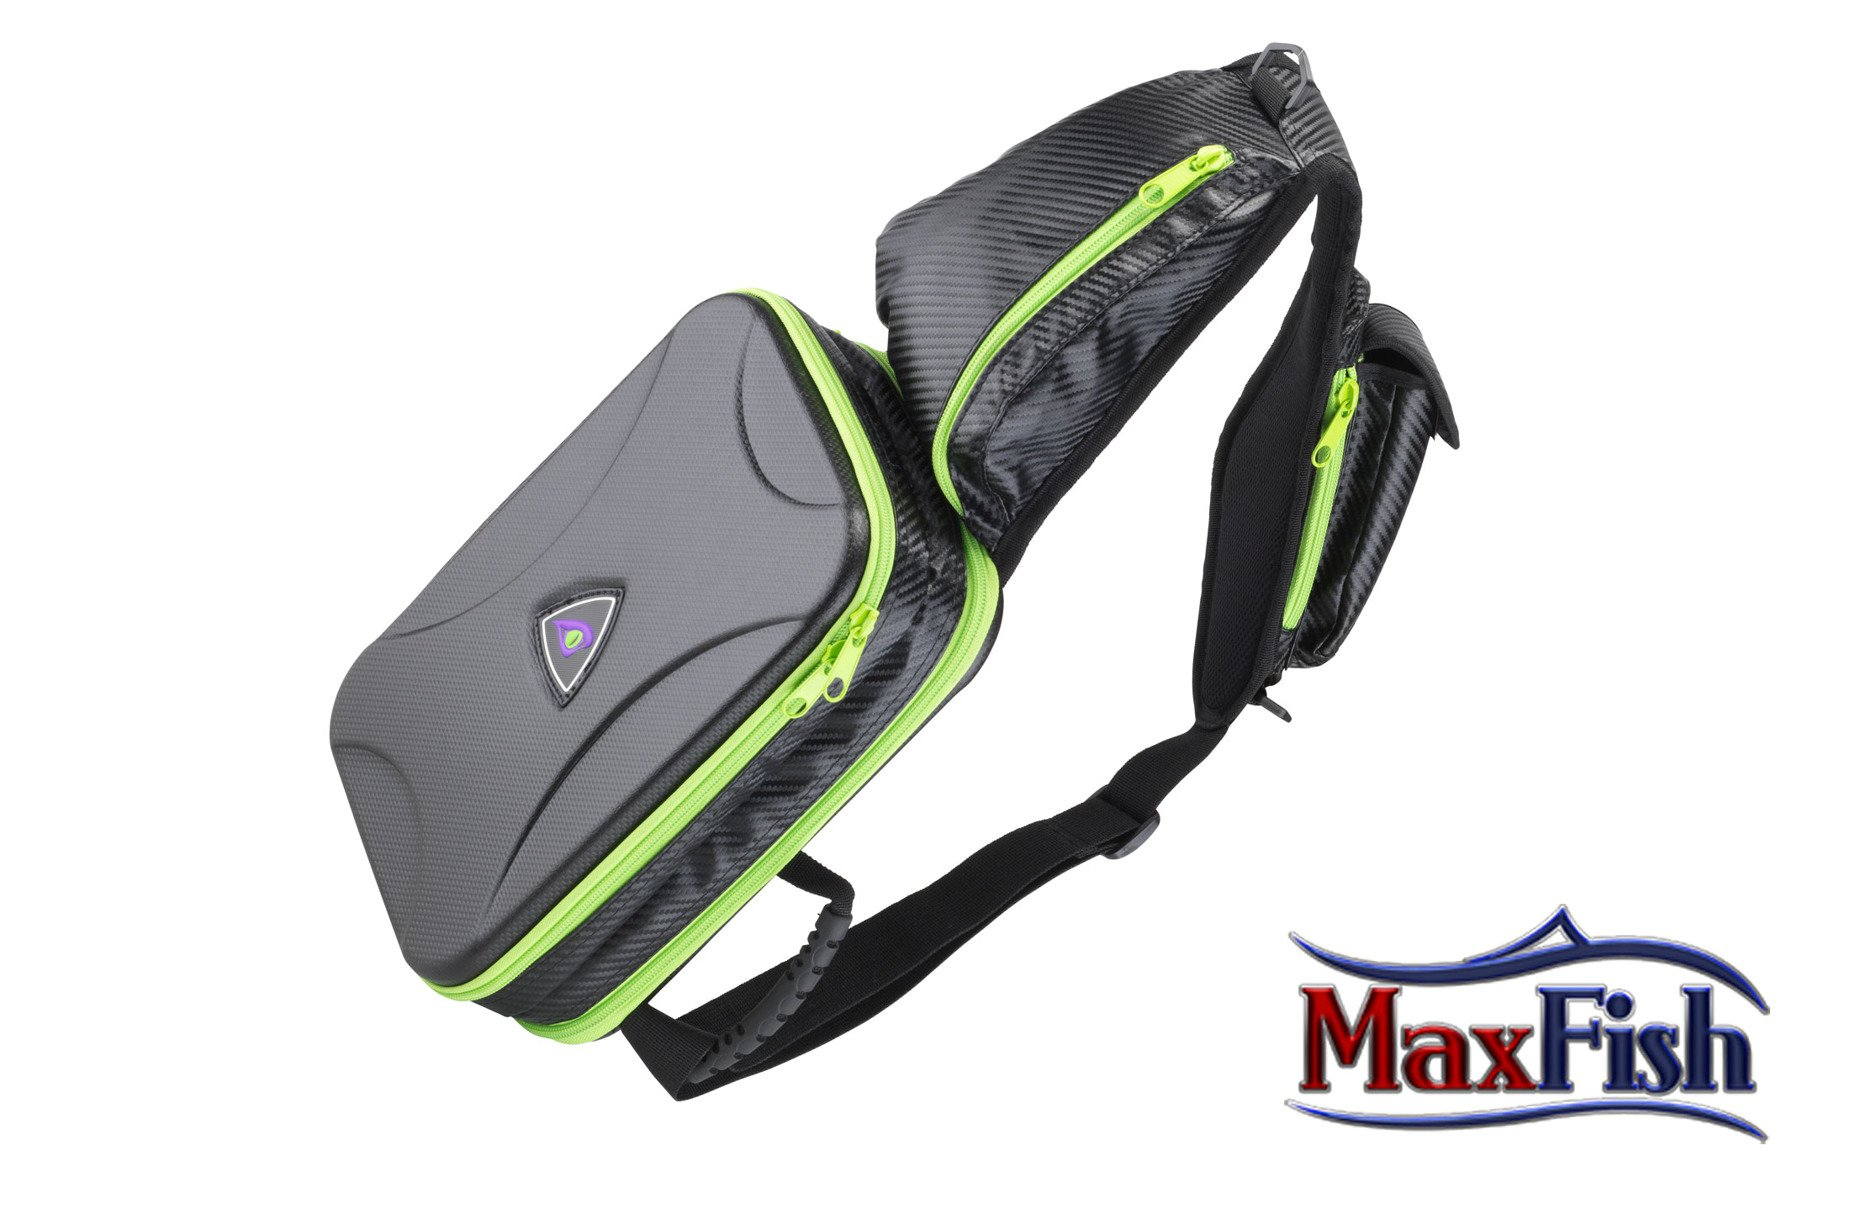 Daiwa Torba Prorex Roving Shoulder Bag